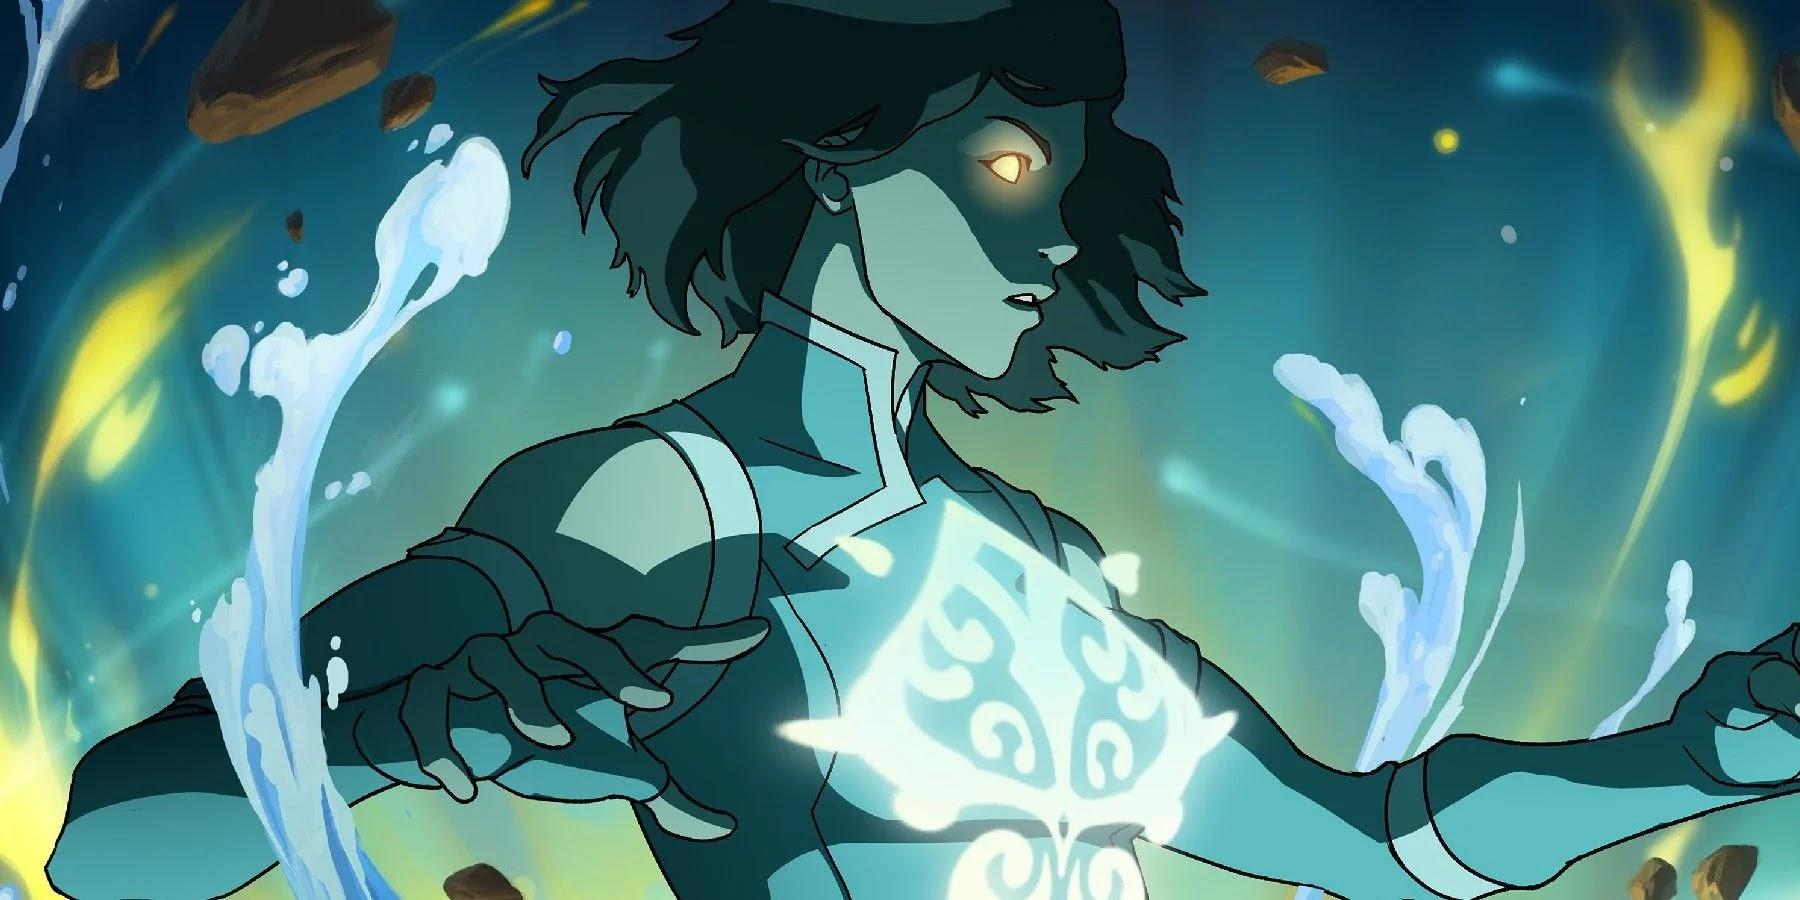 Avatar Korra (Book 1 - 4) Batch Subtitle Indonesia